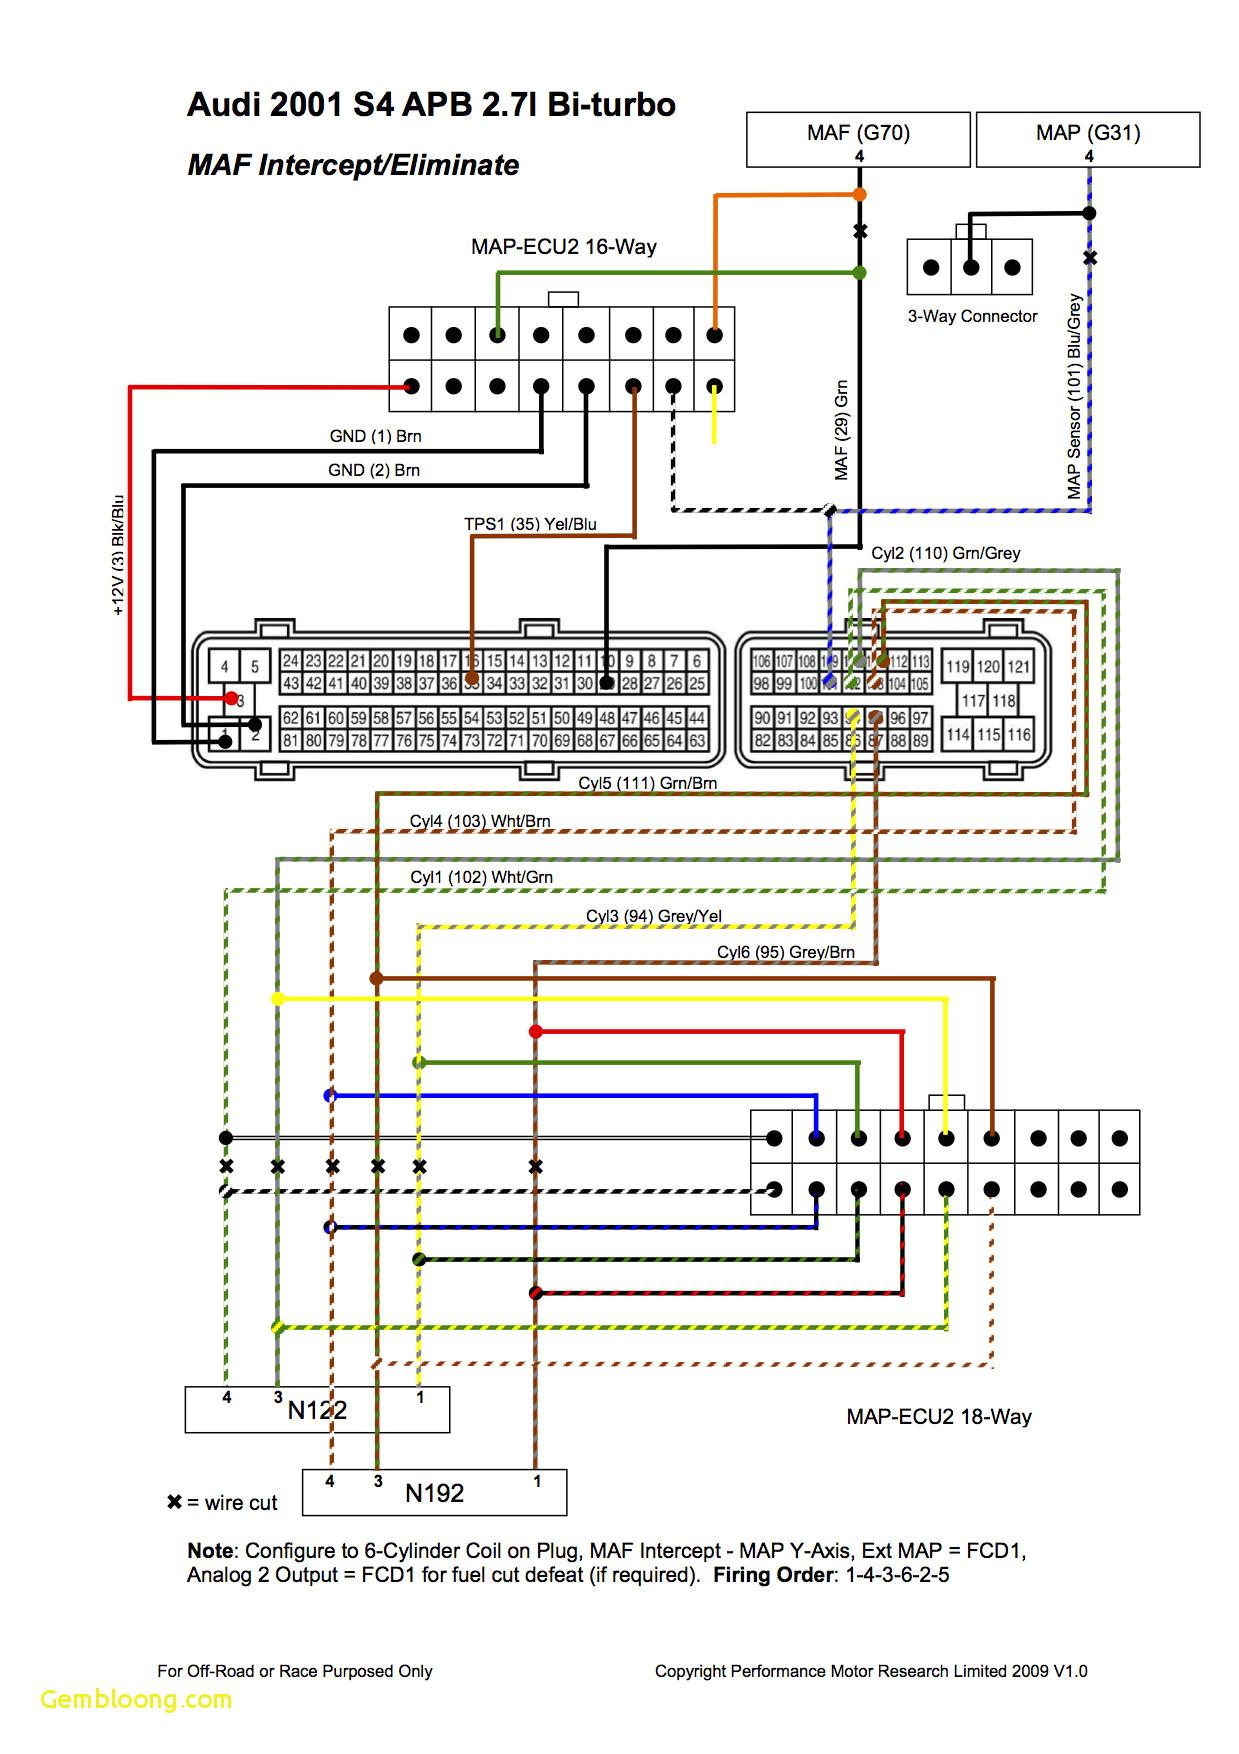 download bmw e36 dme wiring diagram ecu wiring diagram afif of bmw e36 dme wiring diagram 1 jpg